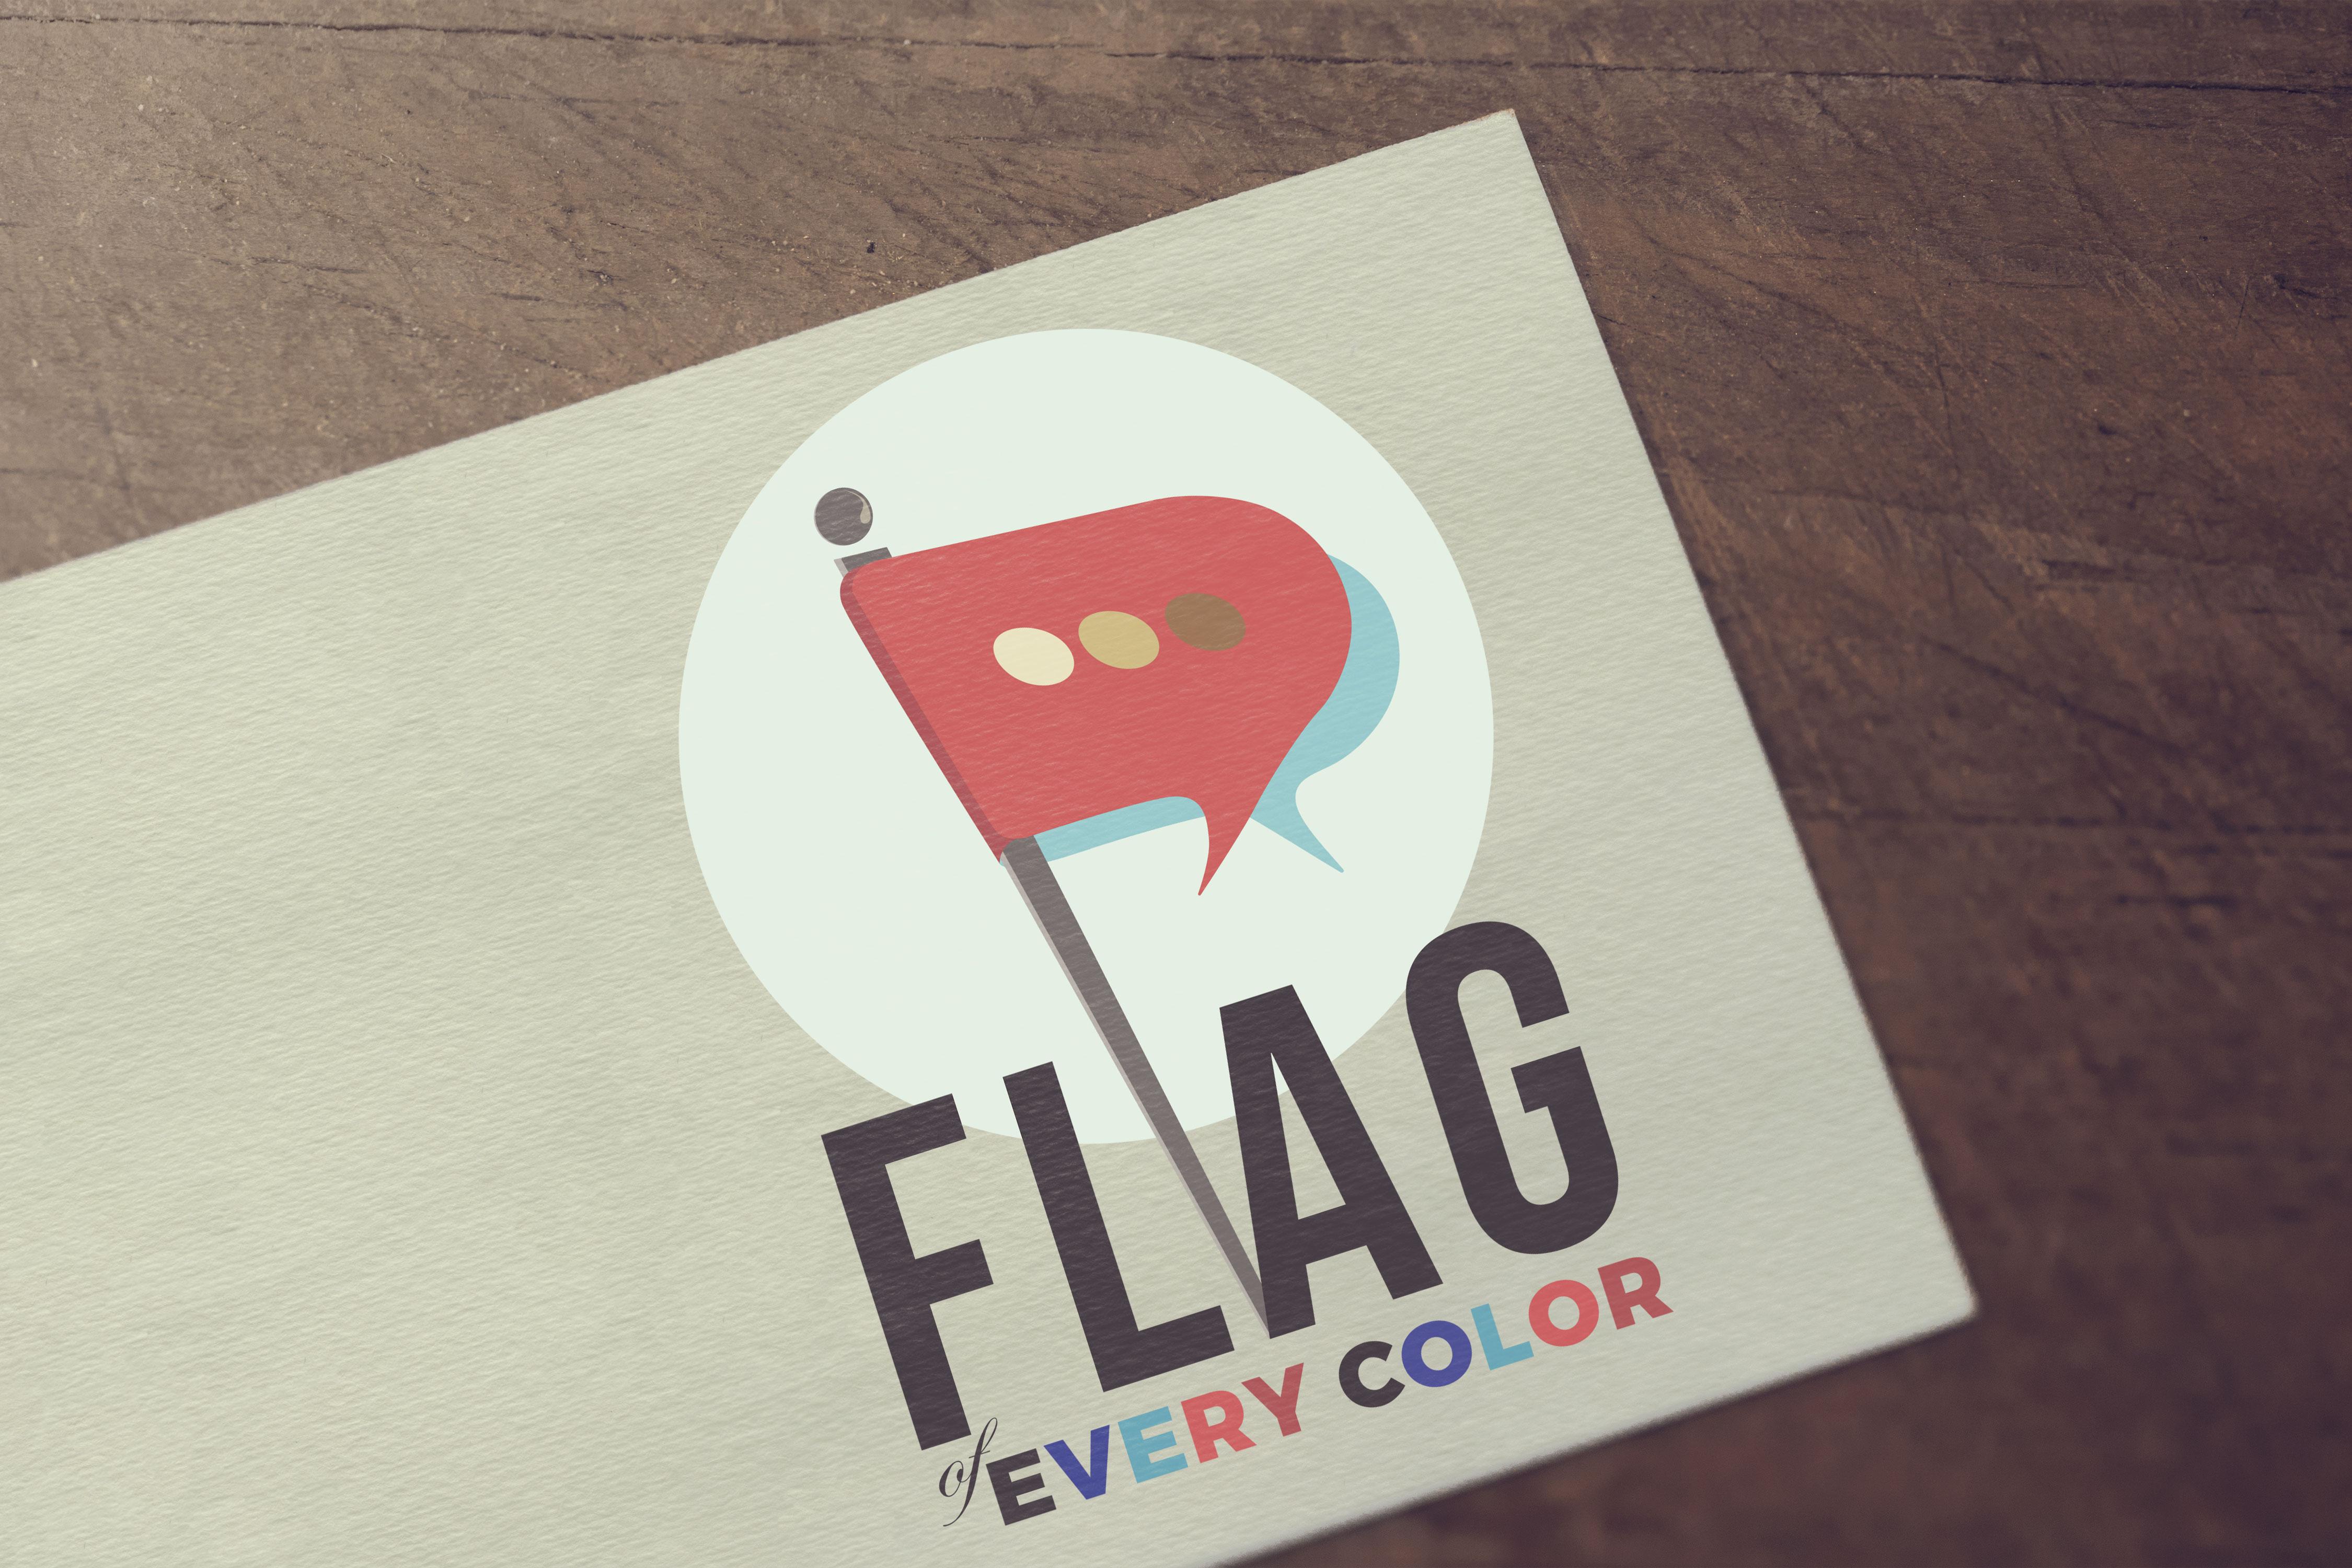 FlagofEveryColor-LOGO